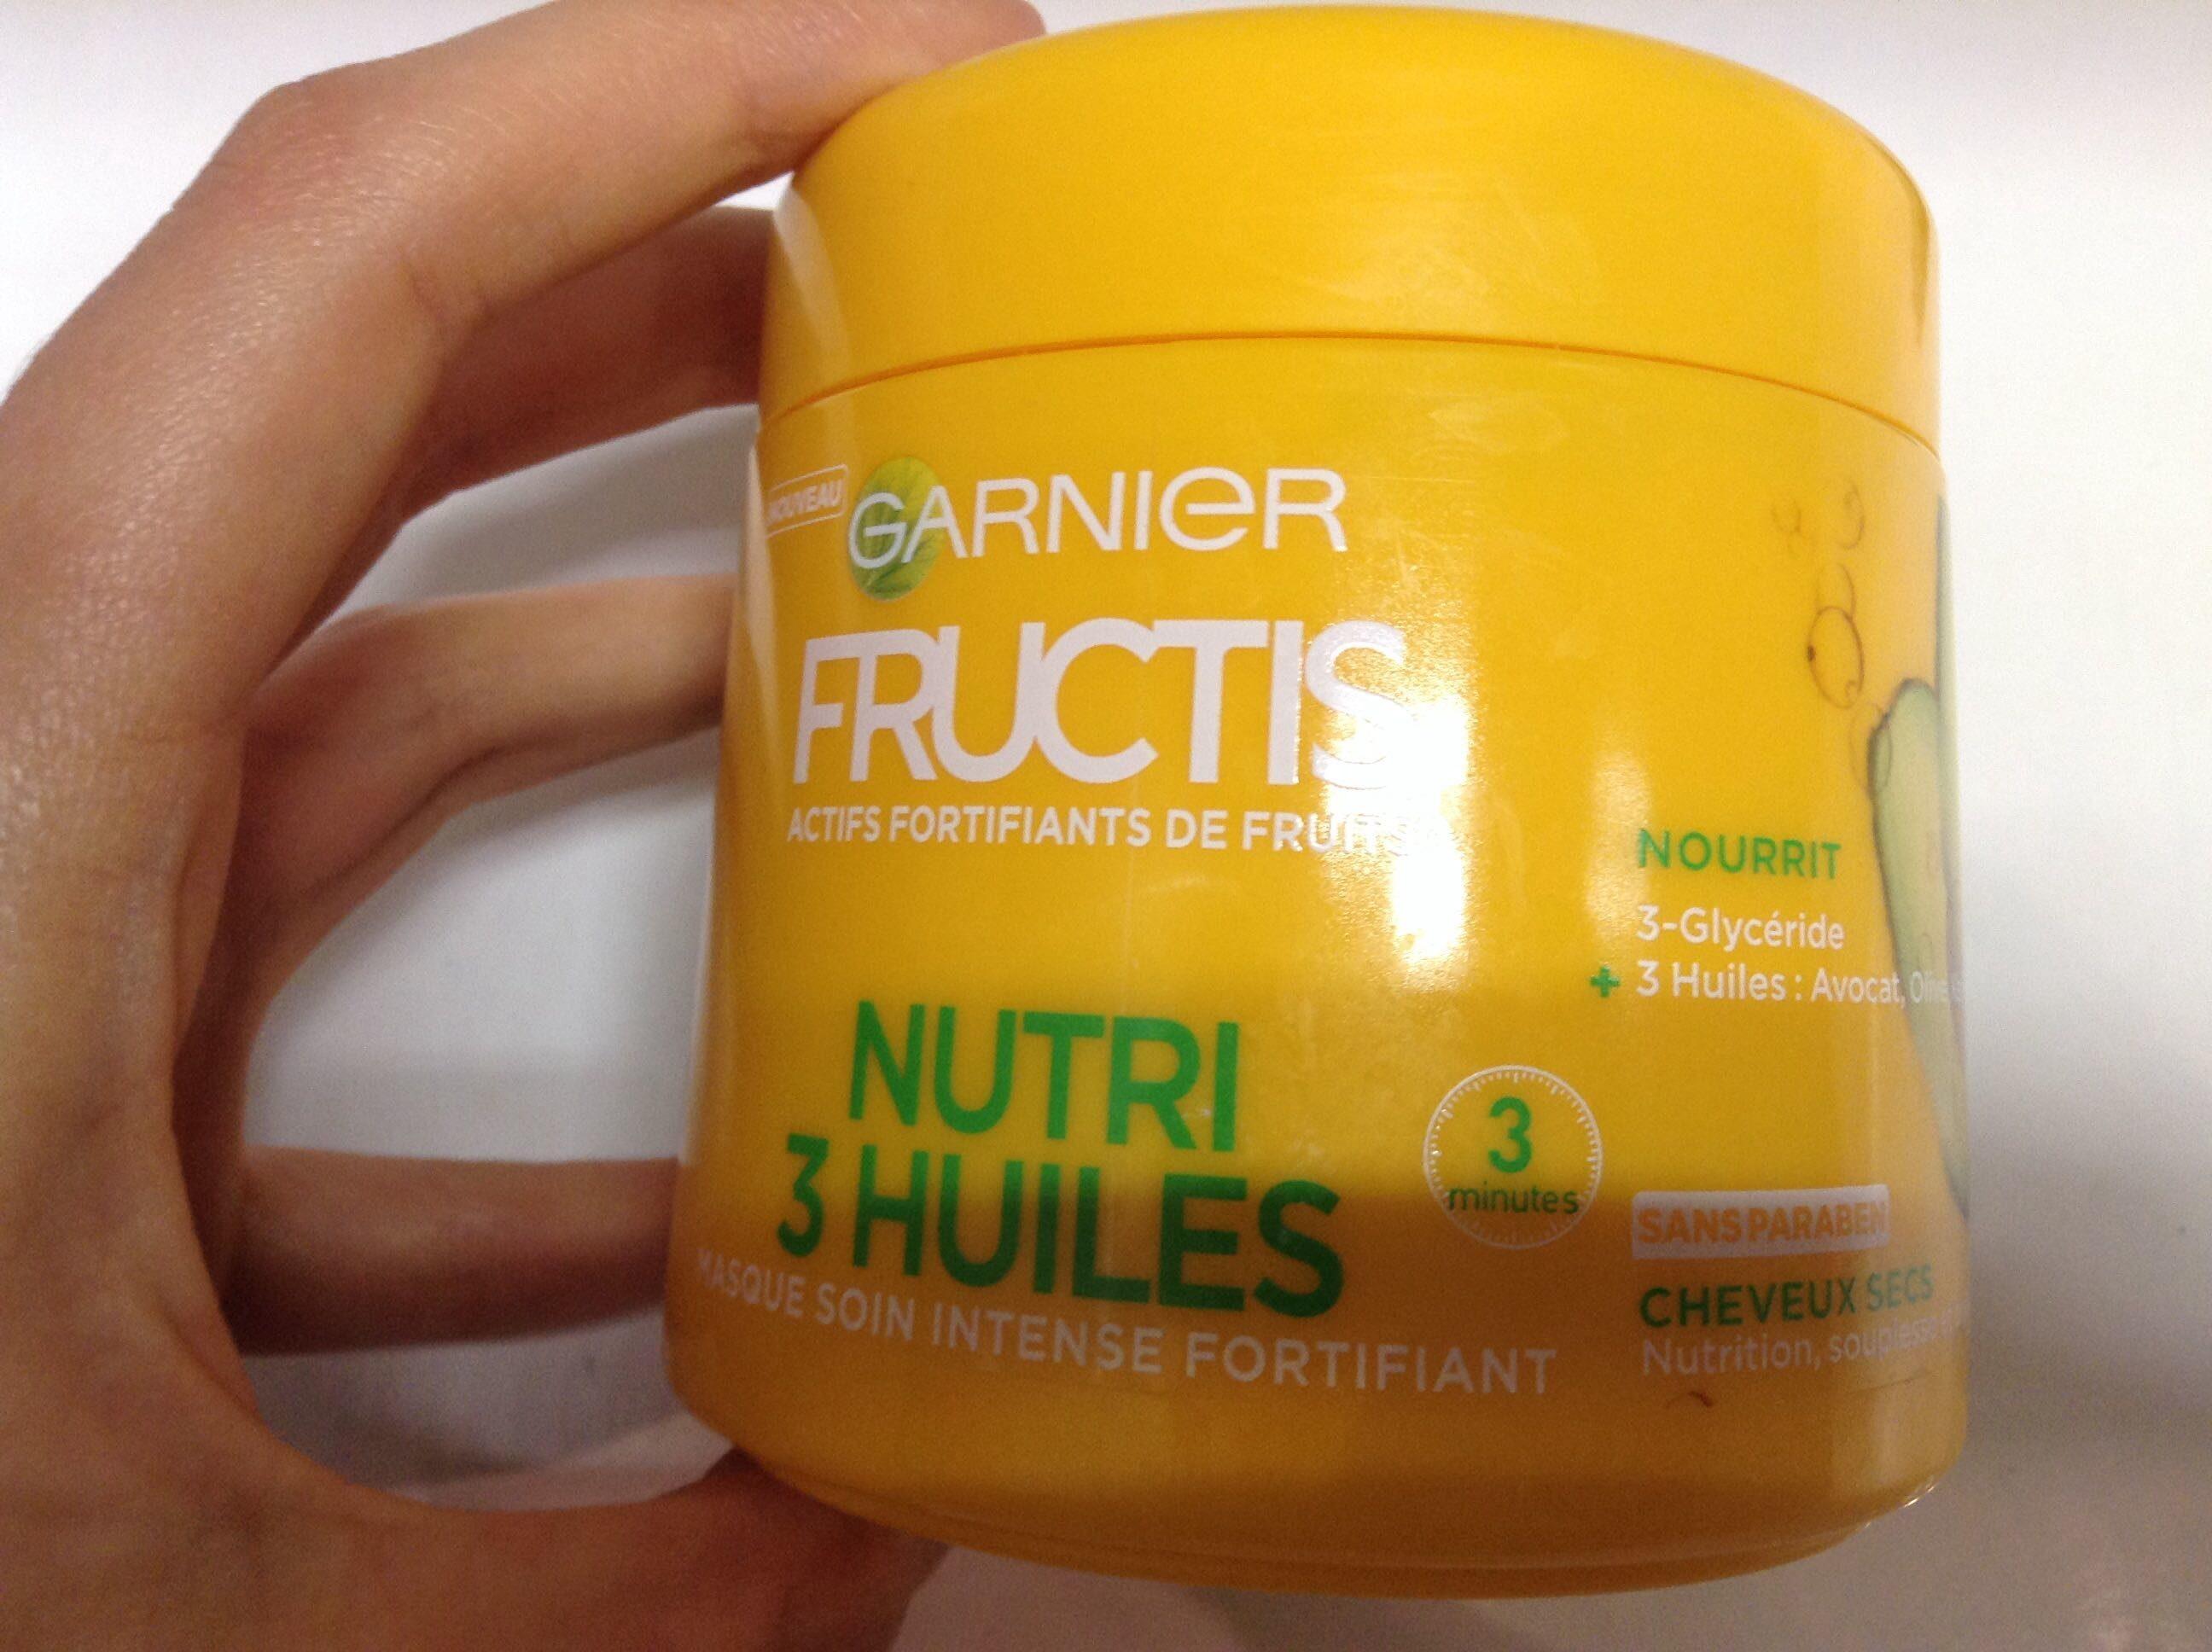 Nutri 3 Huiles Masque soin intense fortifiant - Produit - fr